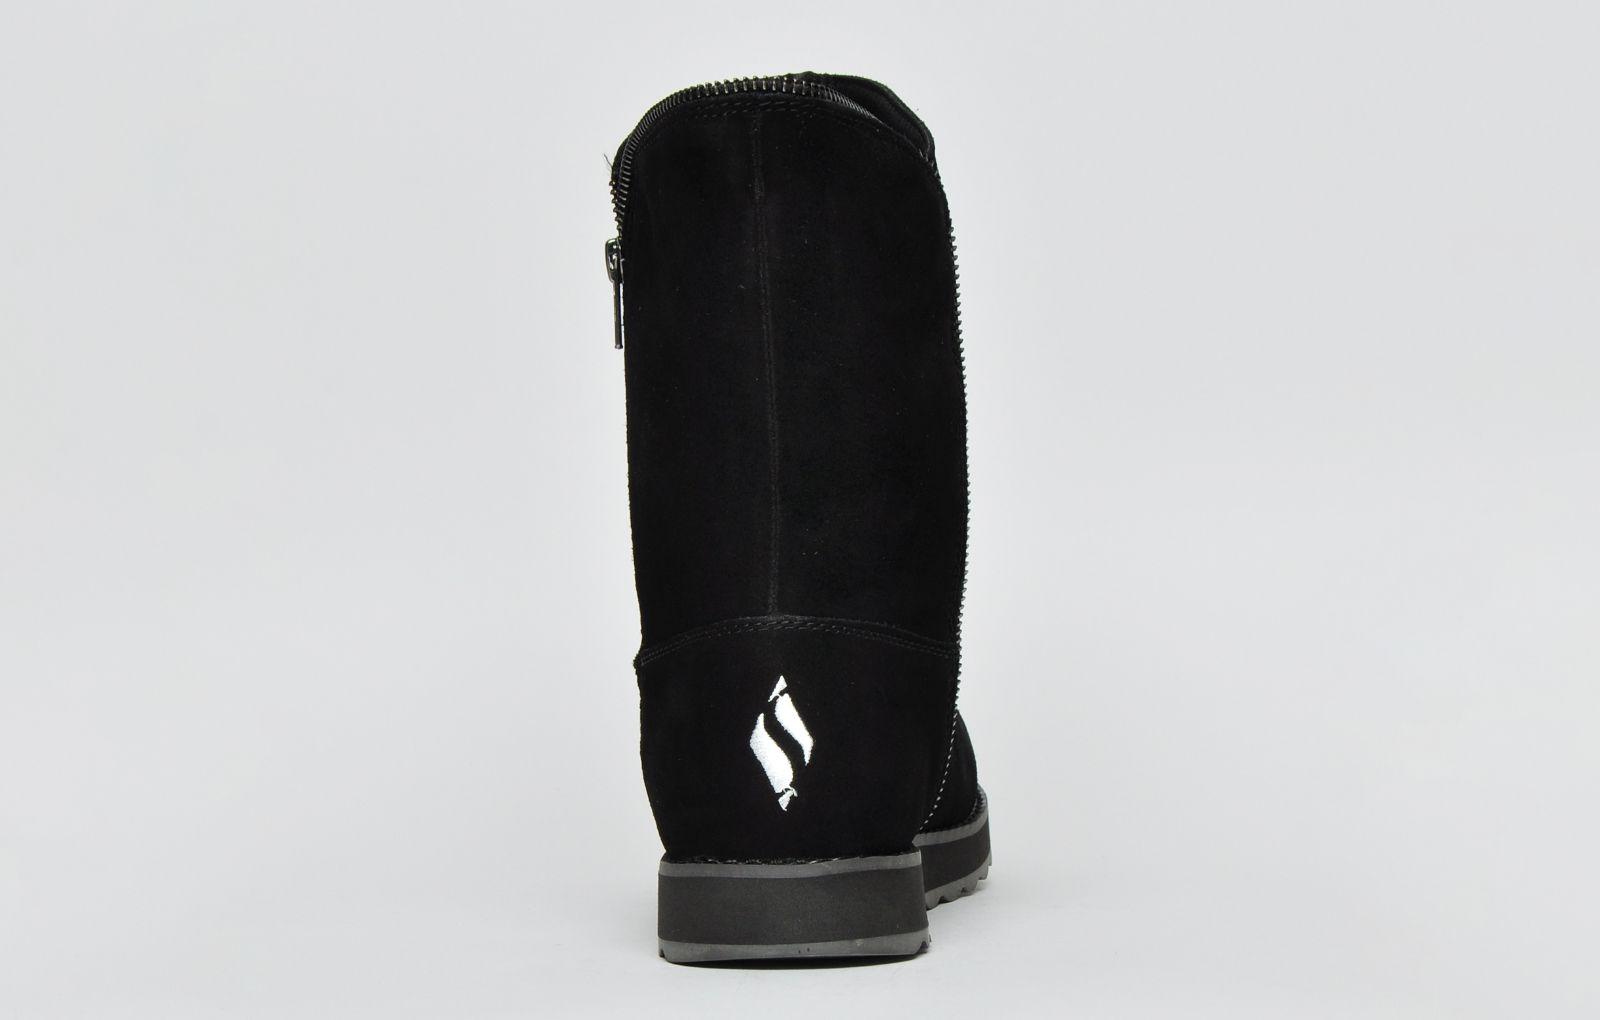 Skechers Keepsakes 2.0 Zip Memory Foam Womens Girls